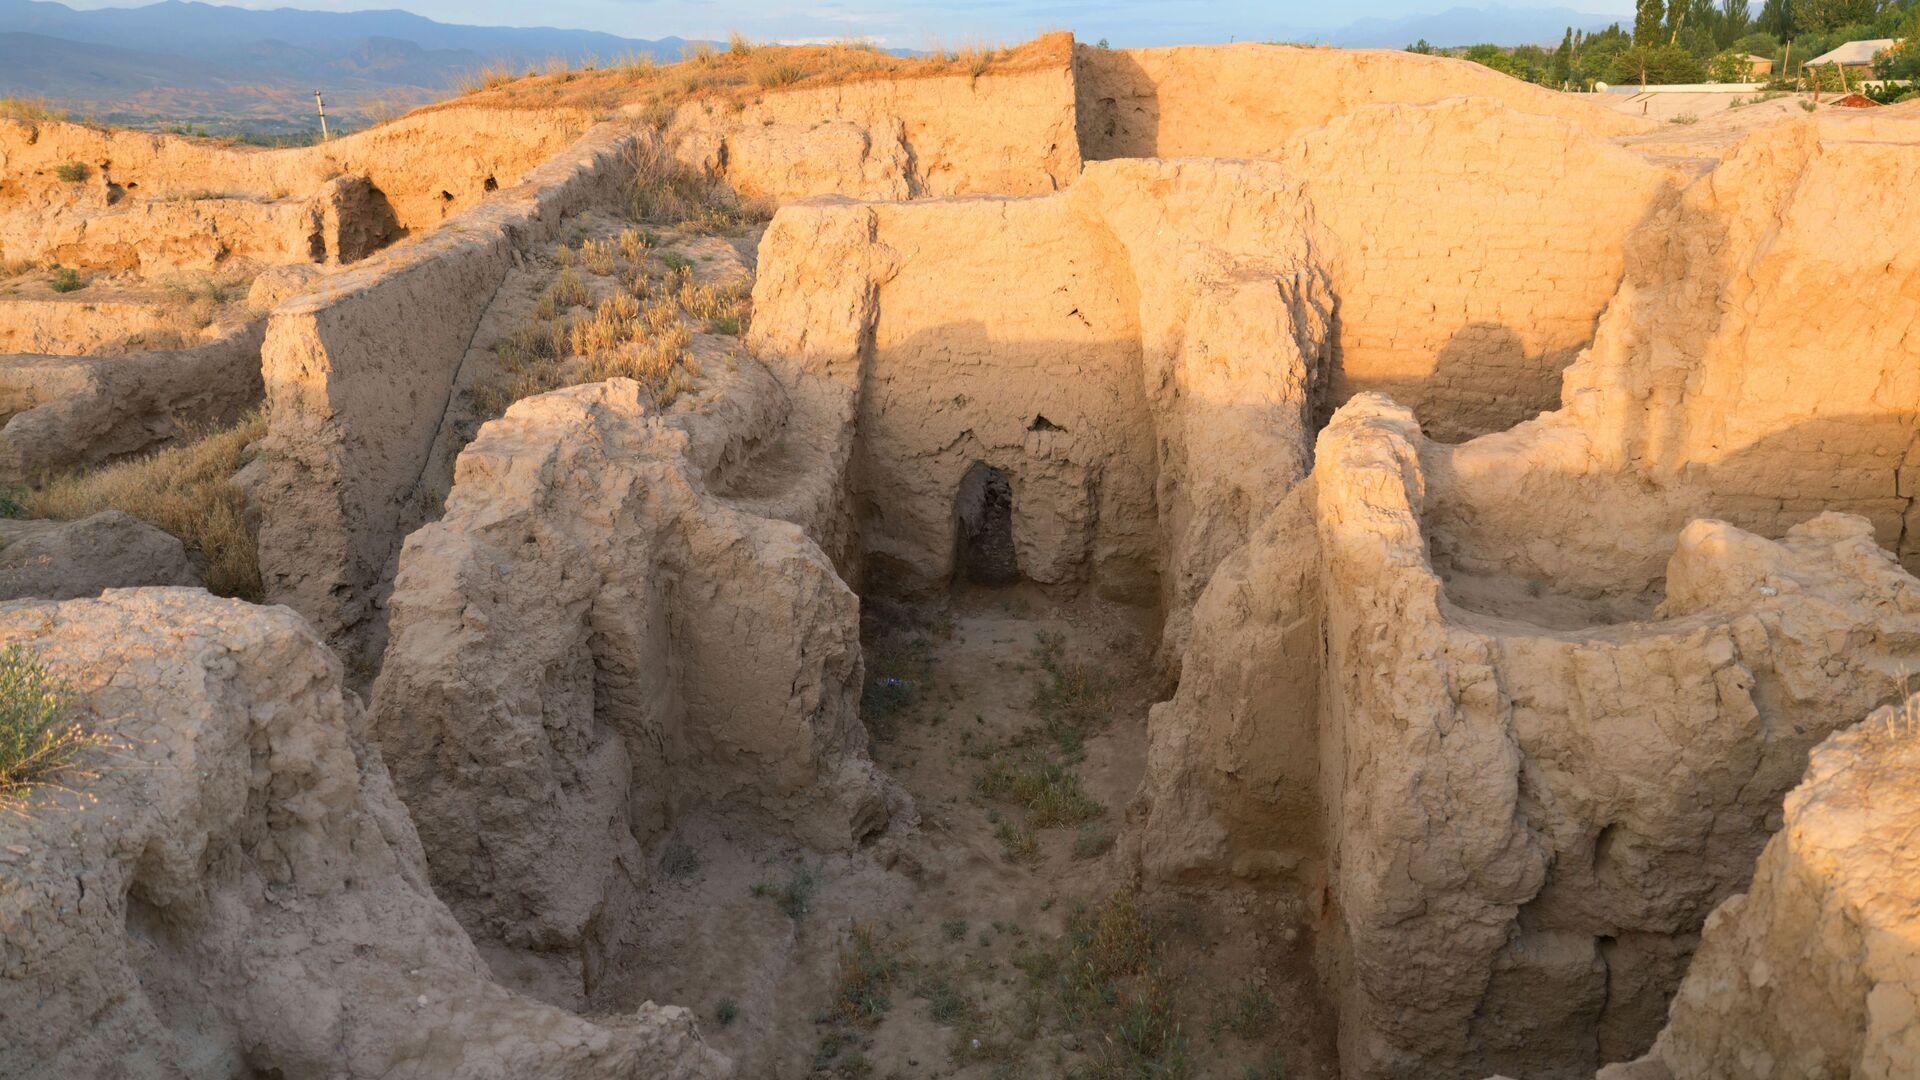 Раскопки древнего городища Пенджакент в Таджикистане - Sputnik Таджикистан, 1920, 29.09.2021